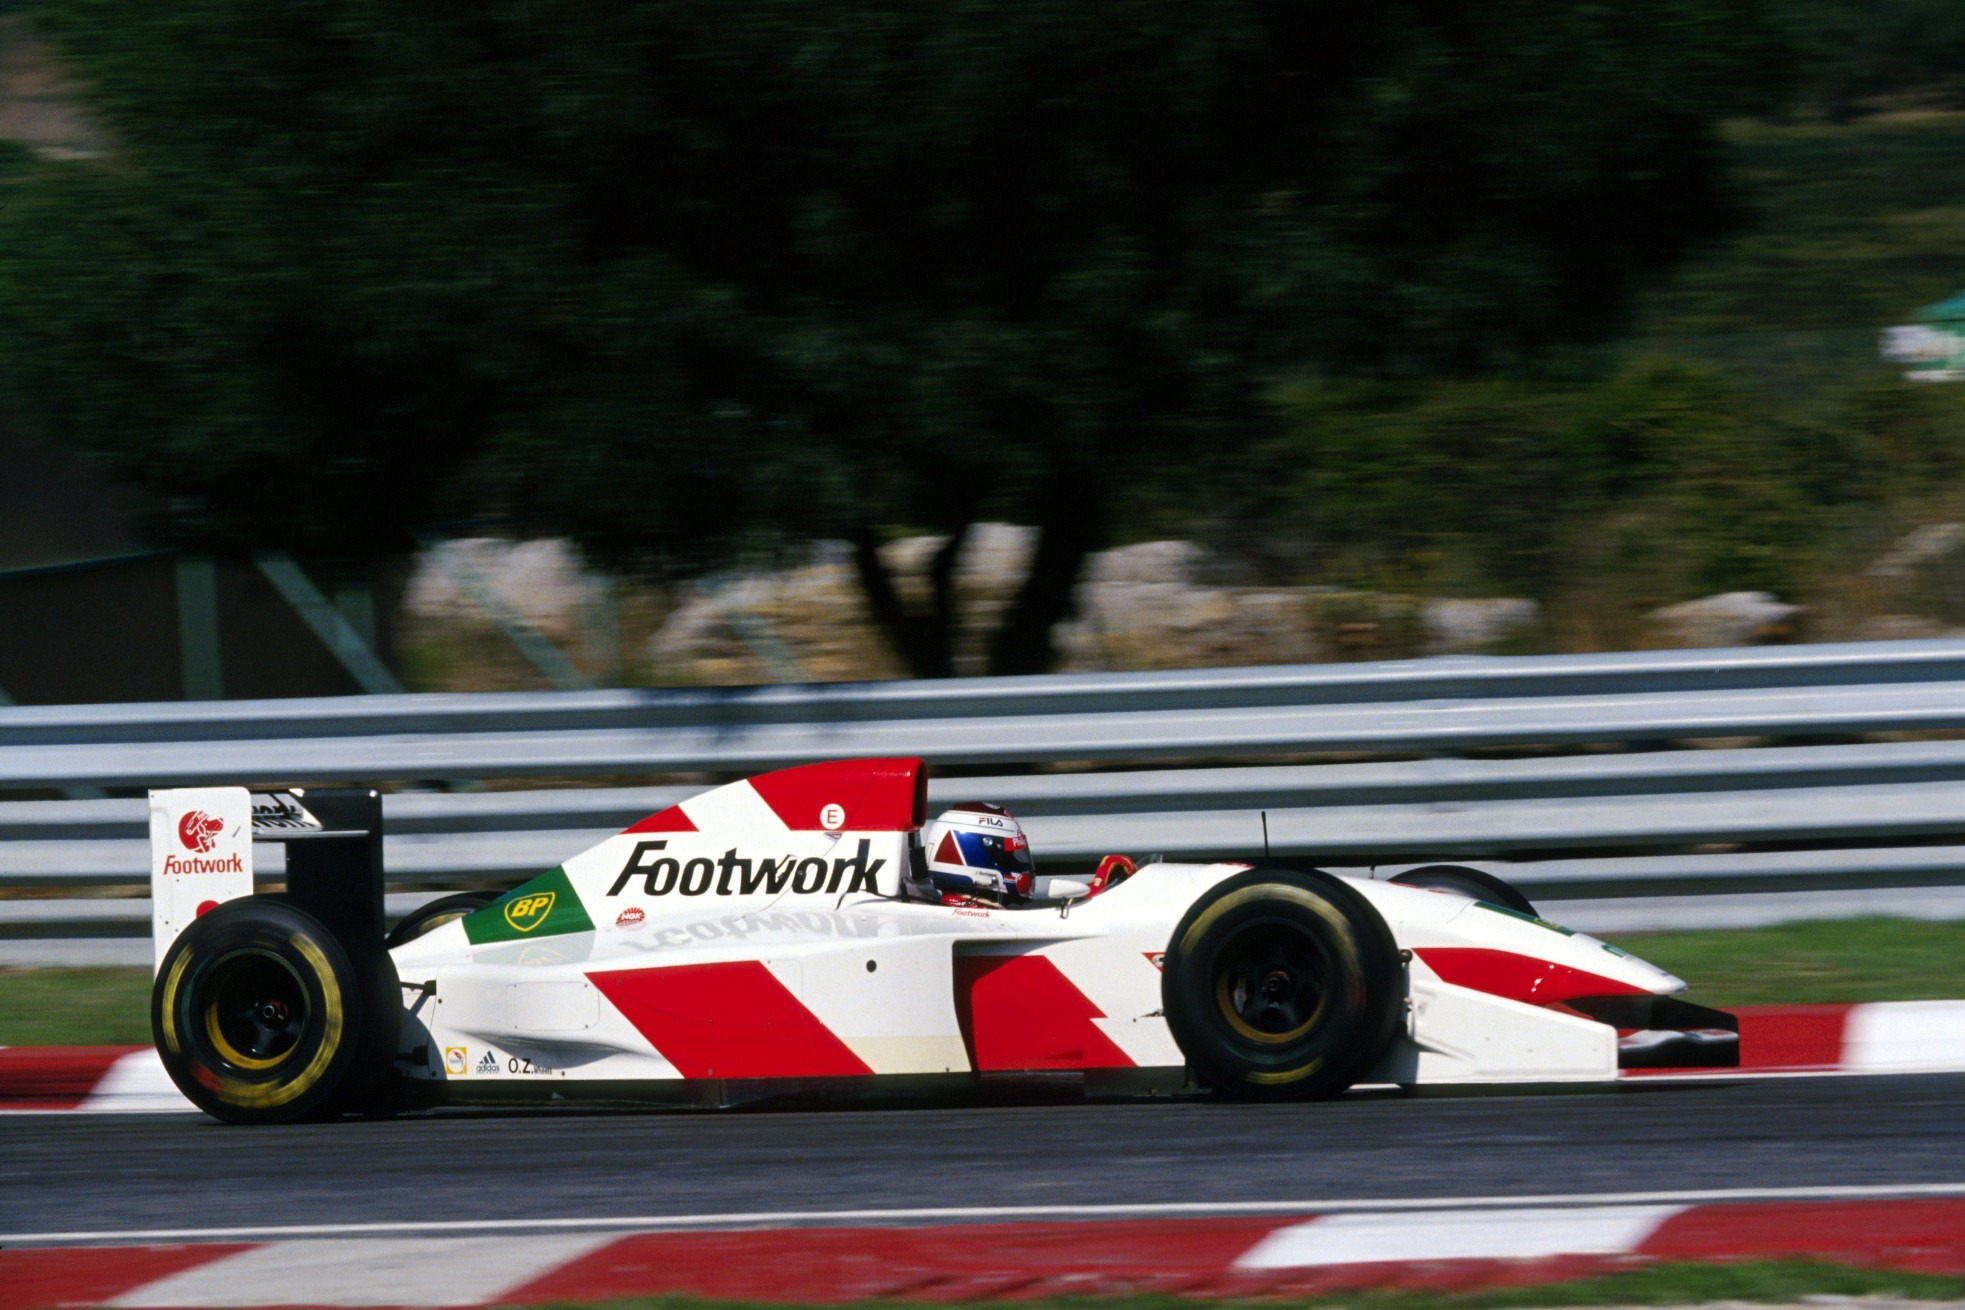 Jos Verstappen, 1993 Footwork test